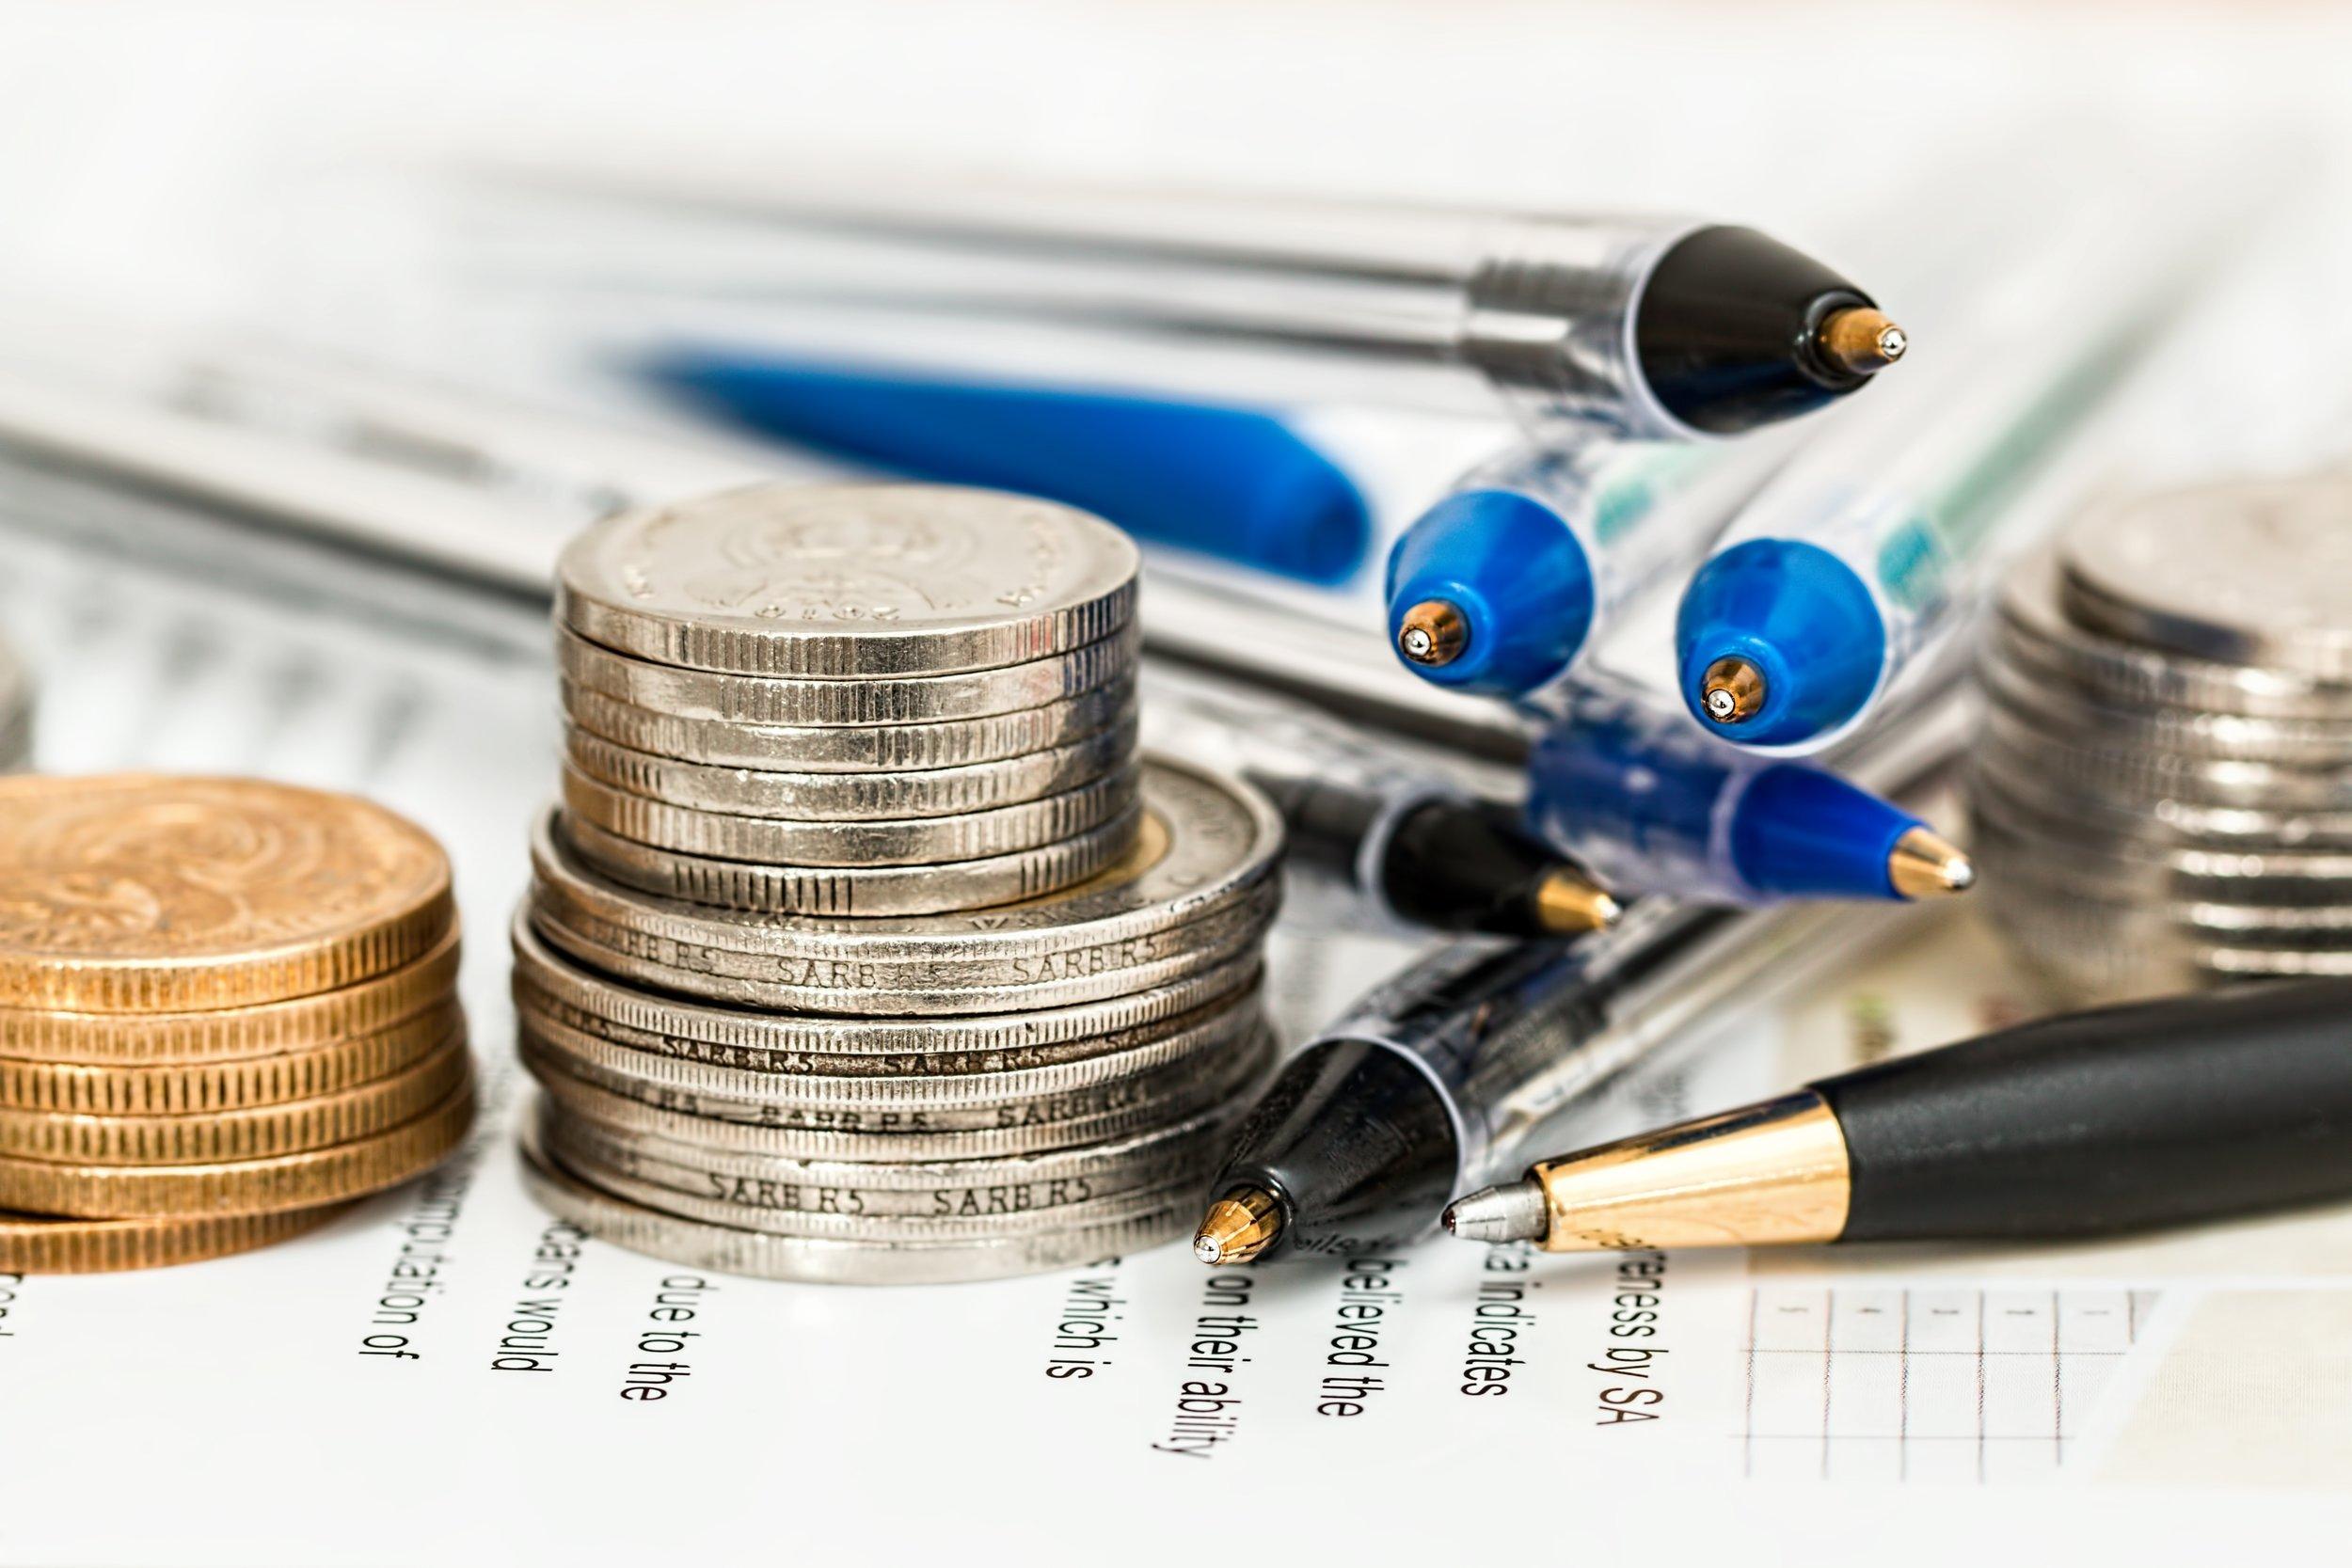 pen-money-office-business-product-cash-859216-pxhere.com.jpg